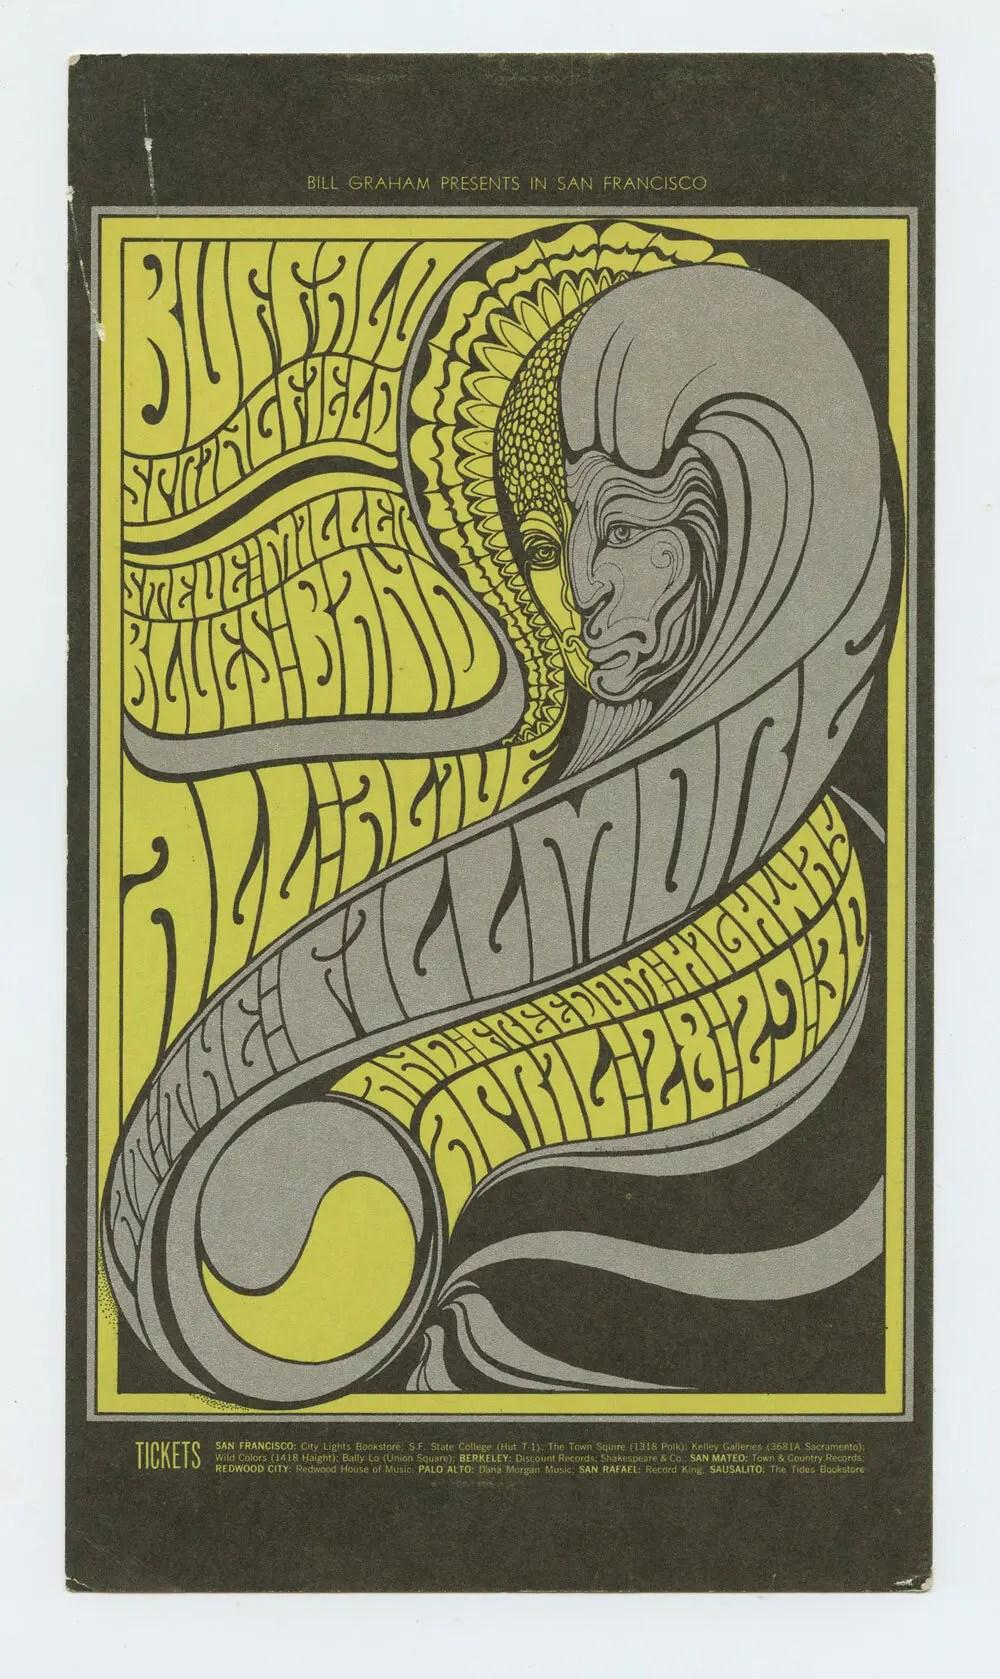 BG 61 Postcard Mailed Buffalo Springfield Steve Miller 1967 Apr 28